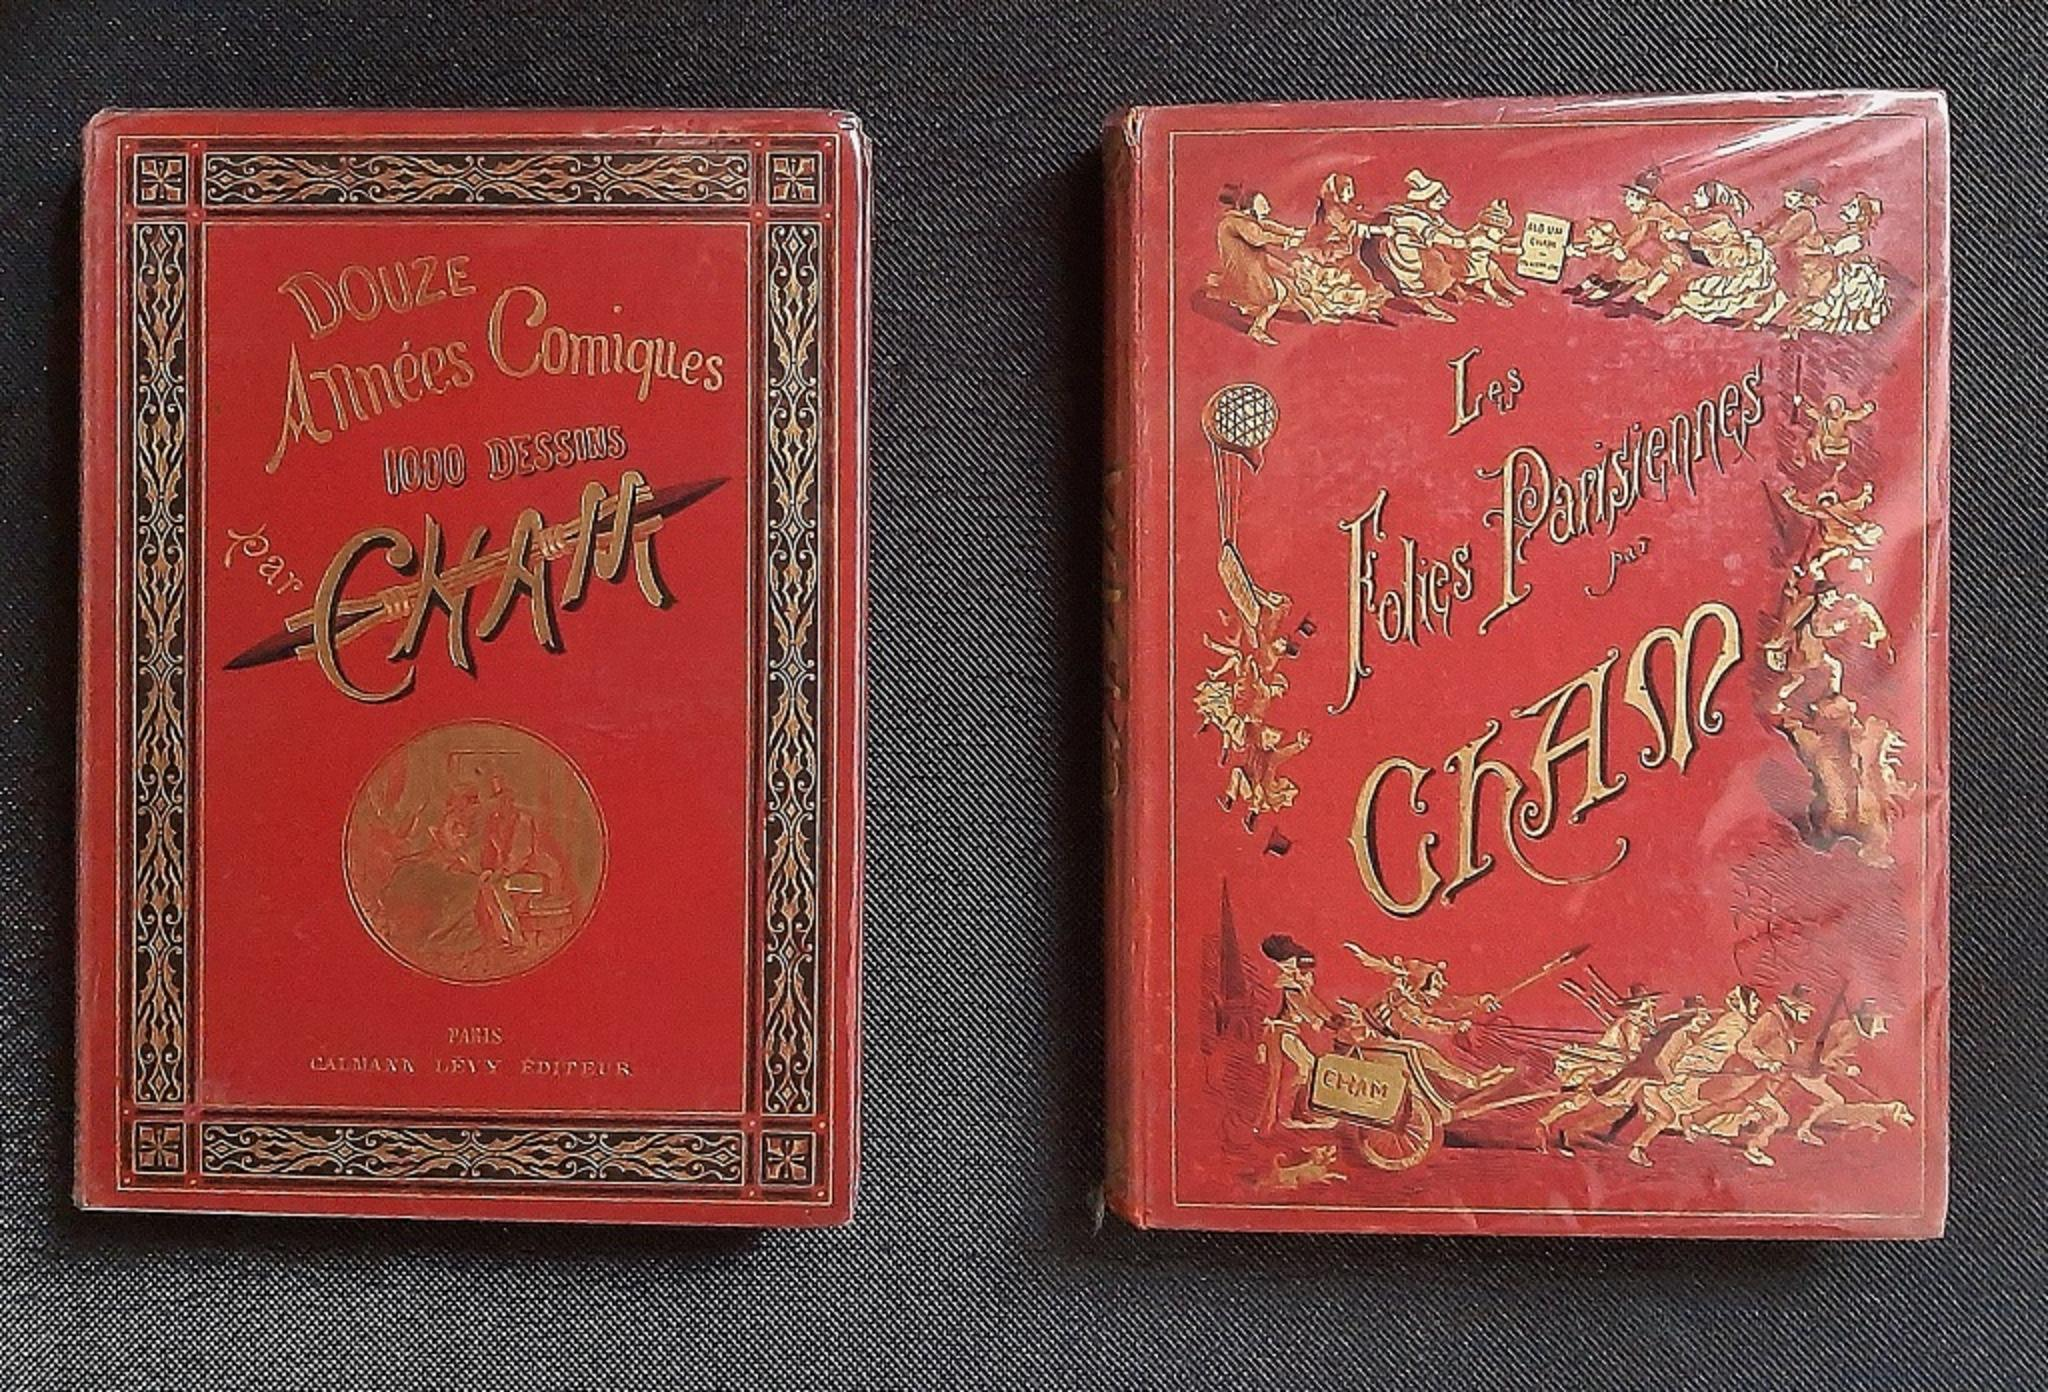 Les Folies Parisiennes - Vintage Rare Book Illustrated by CHAM - 1883